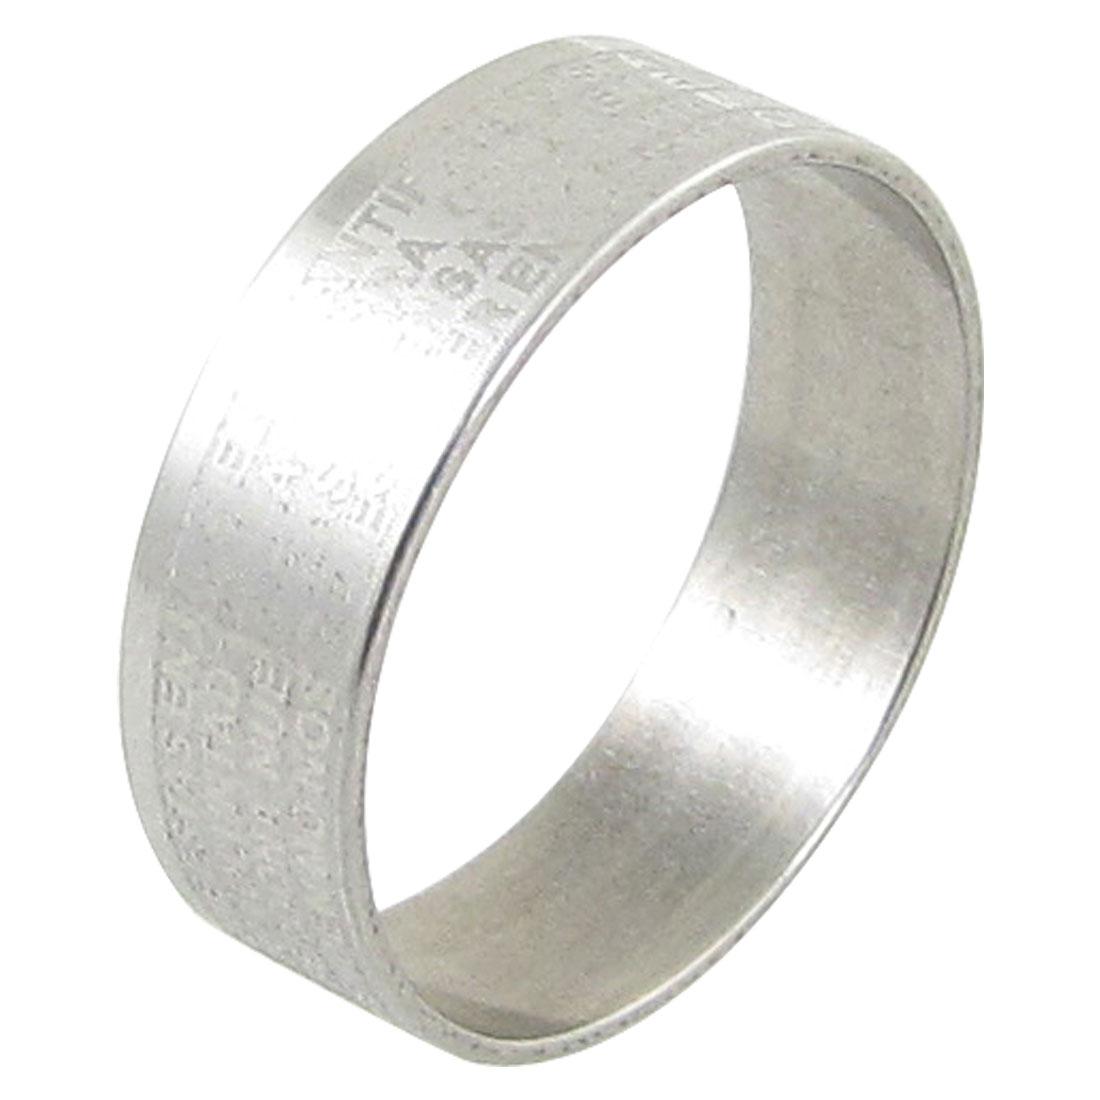 Silver Tone Cross Pattern Finger Ring US Sz 8 1/4 for Men